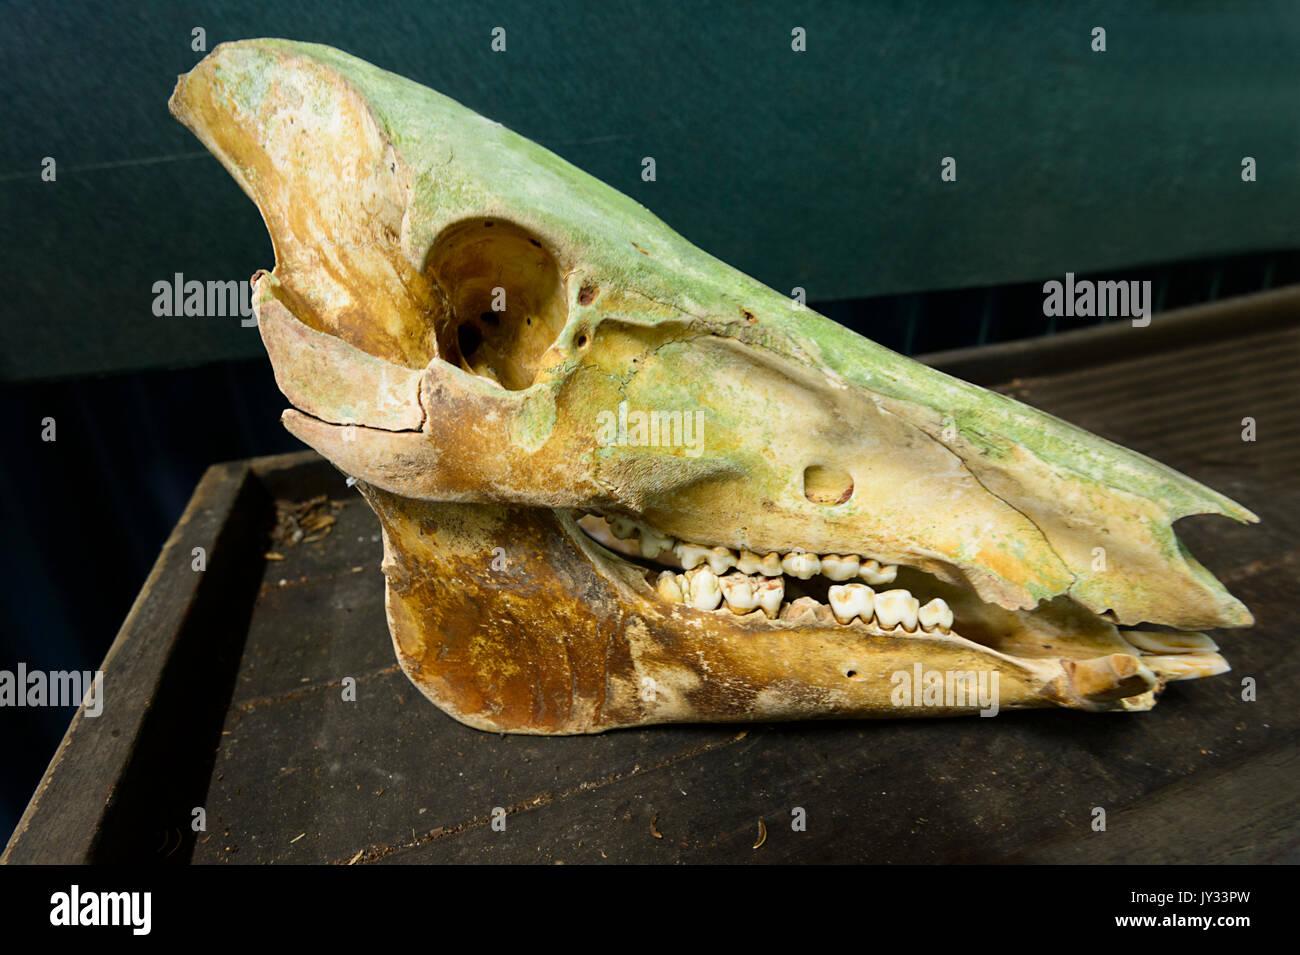 Pig Skeleton Stock Photos & Pig Skeleton Stock Images - Alamy